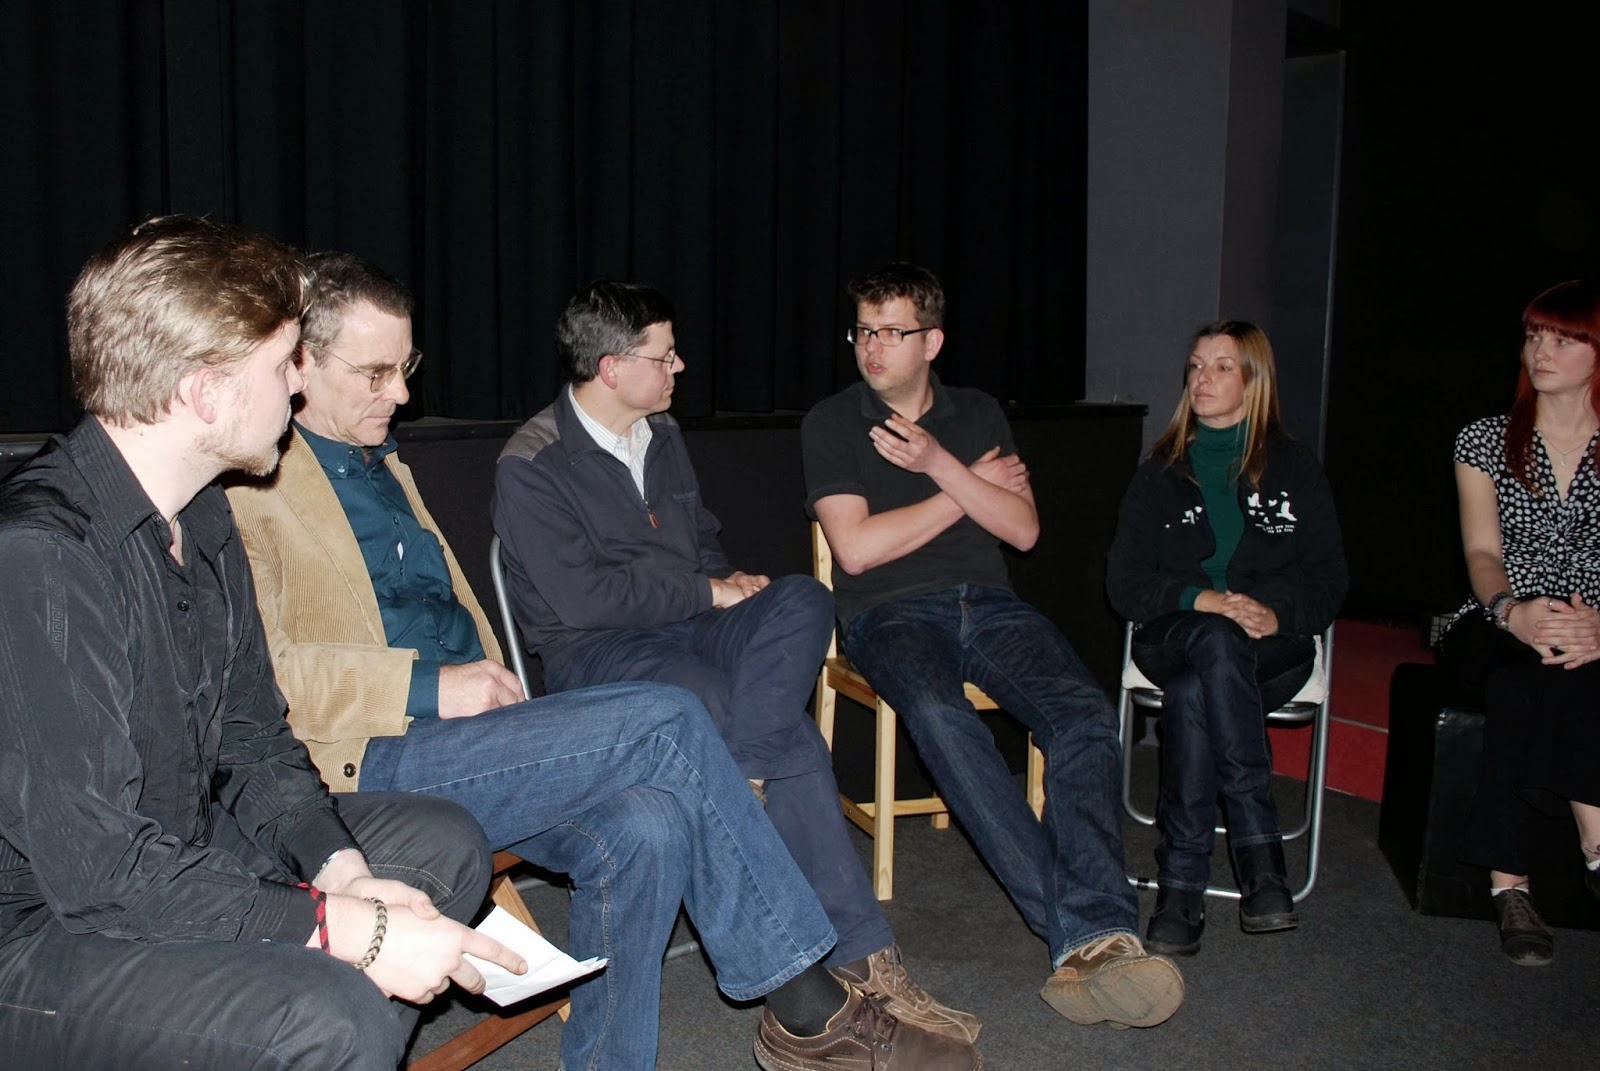 Podiumsdiskussion in Halle (von links nach rechts): Veranstalter, Zoo-Direktor, Amtsveterinär, Tierarzt, tierbefreier-Vertreterin, Veranstalterin)